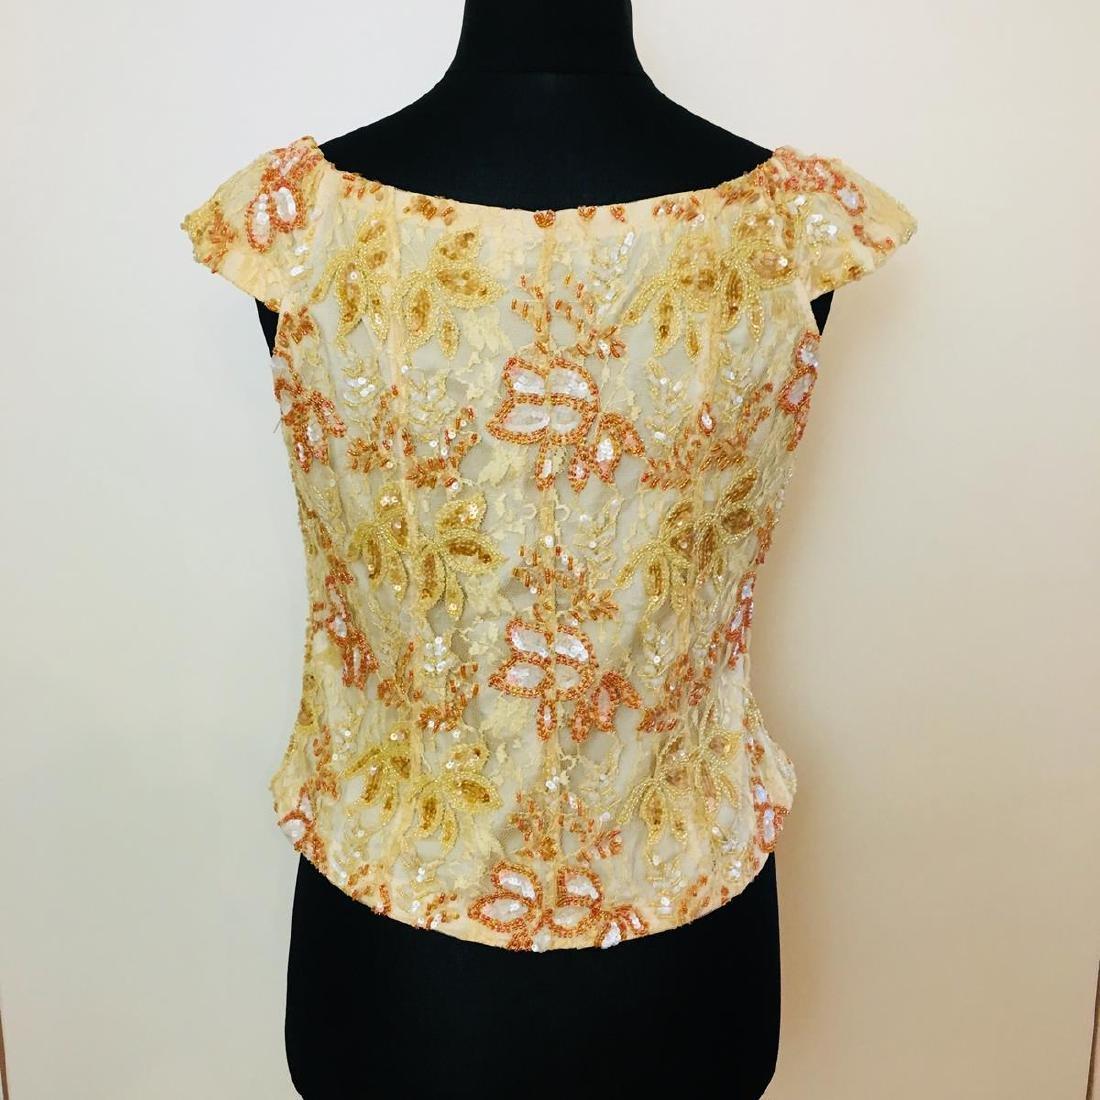 Vintage Women's Collection Designer Blouse Shirt Top - 5